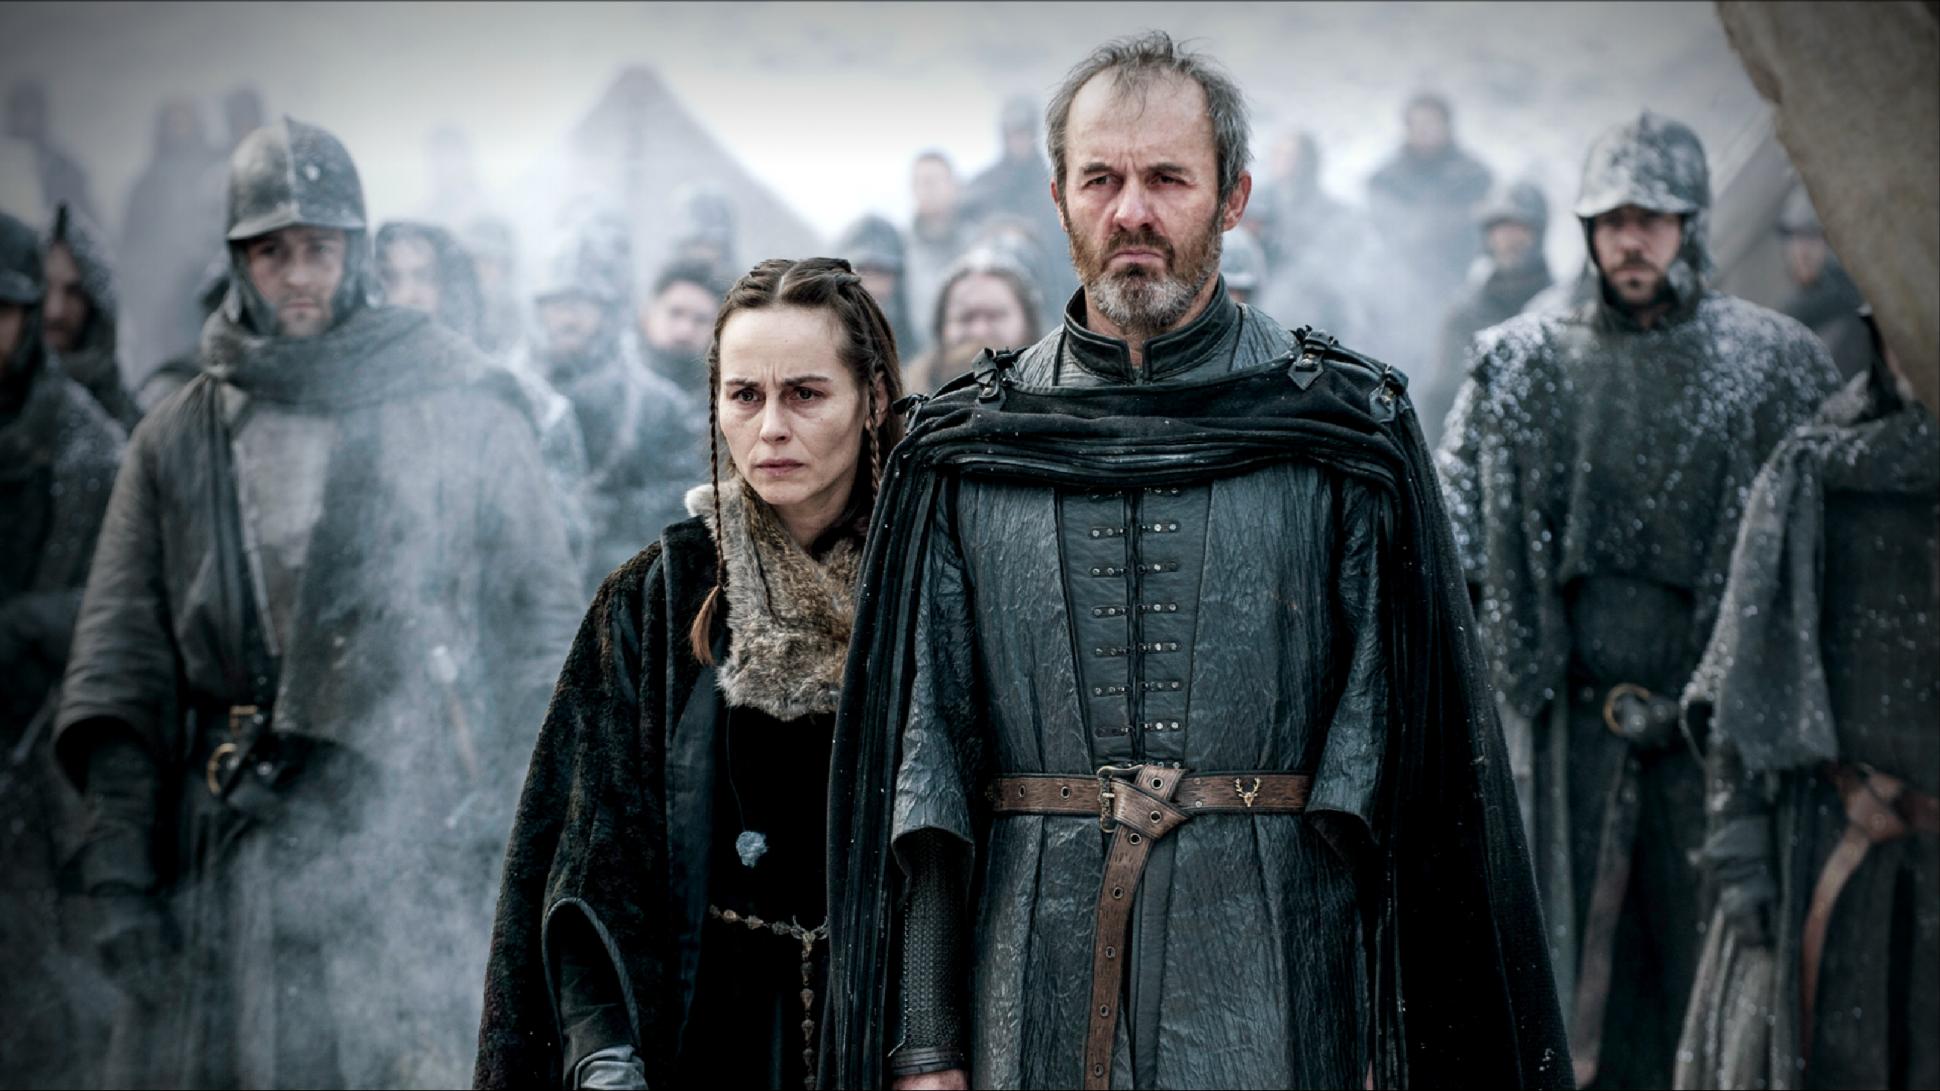 Peor padre Baratheon Stannis